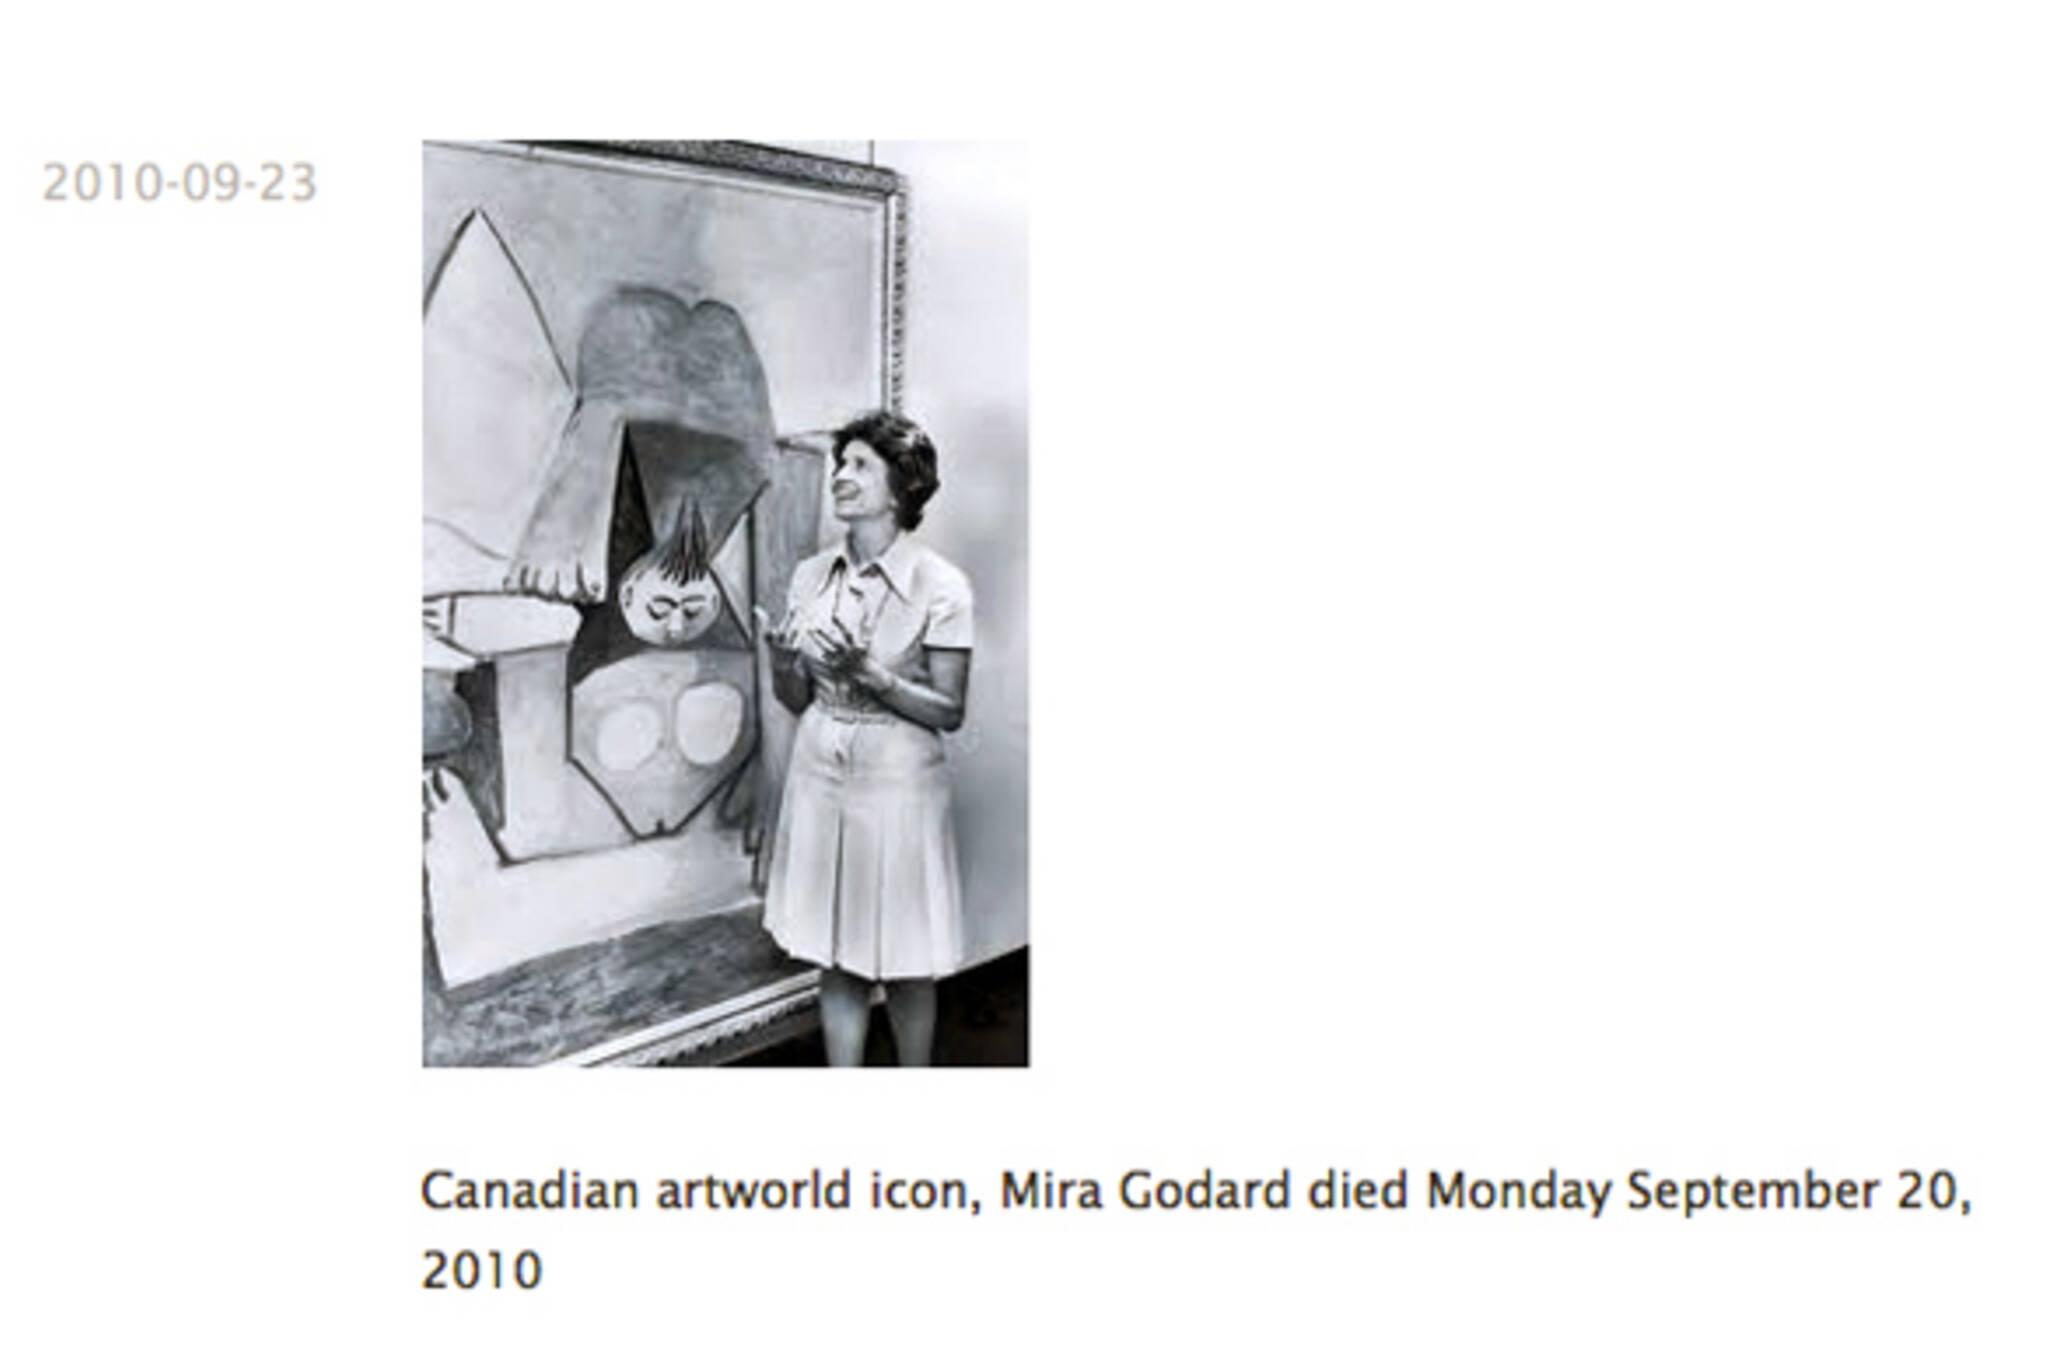 Mira Godard dies